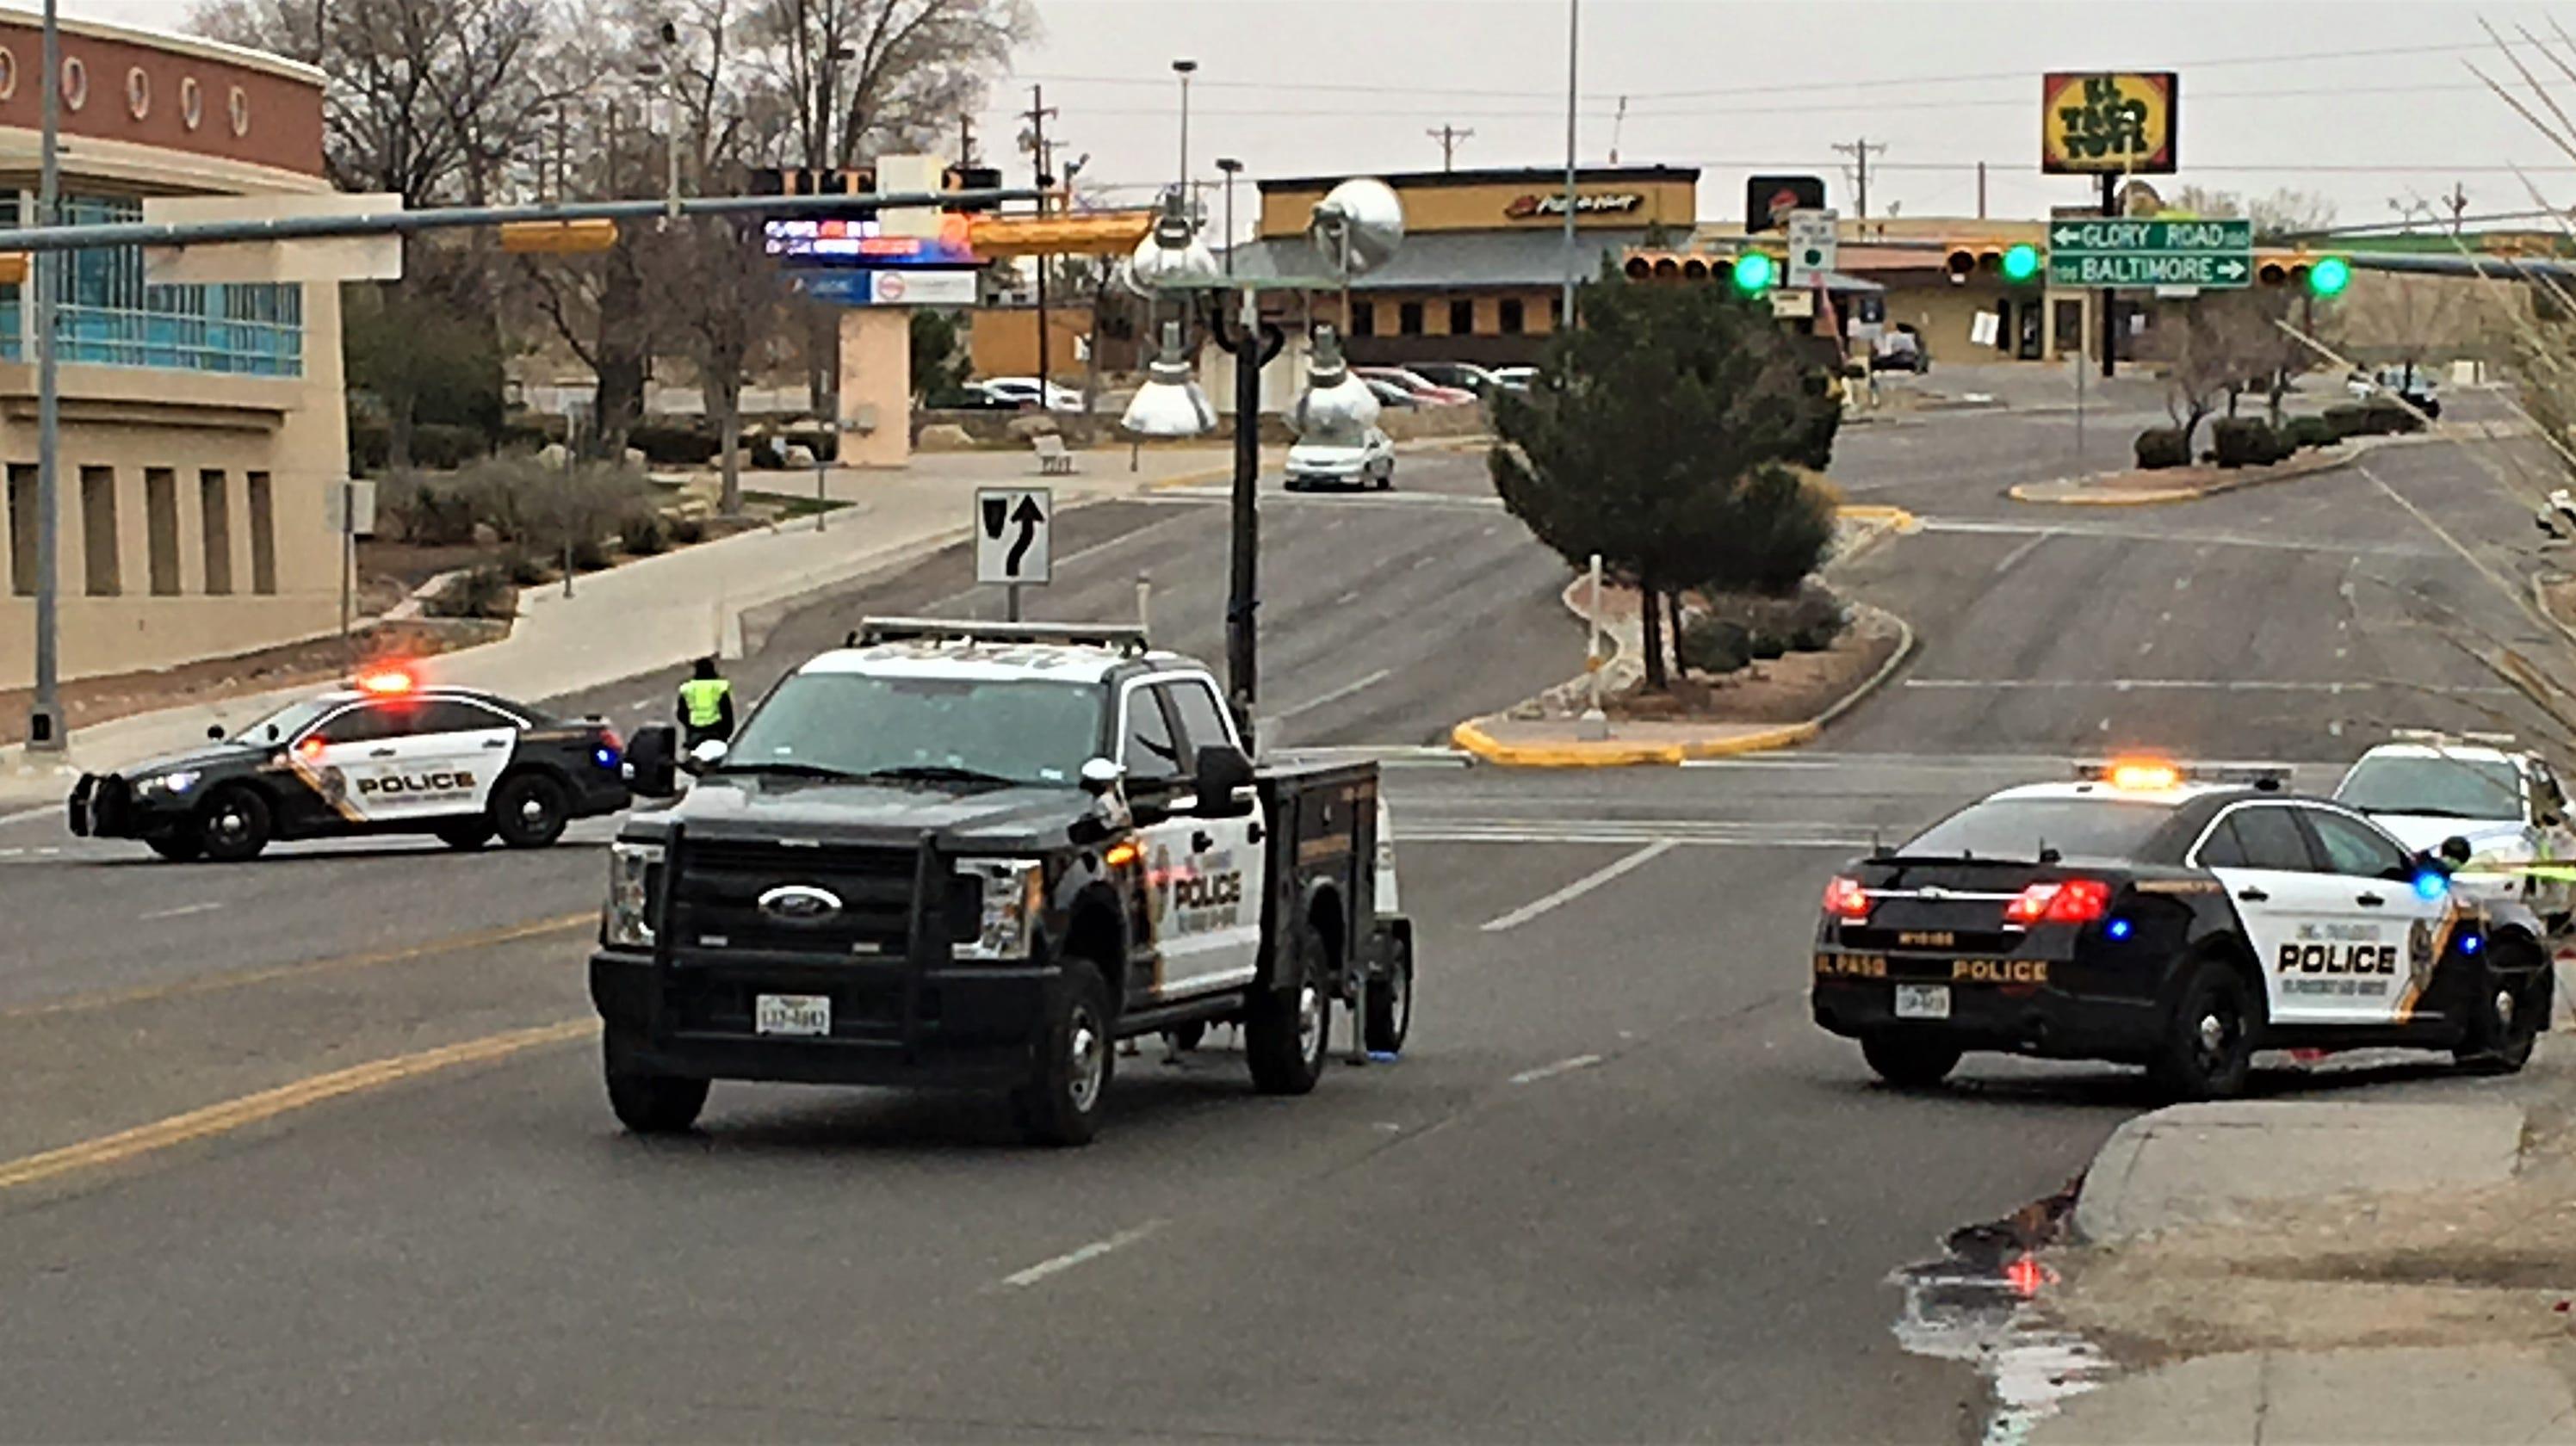 Man severely injured in brawl at Cincinnati Avenue Entertainment District in West El Paso